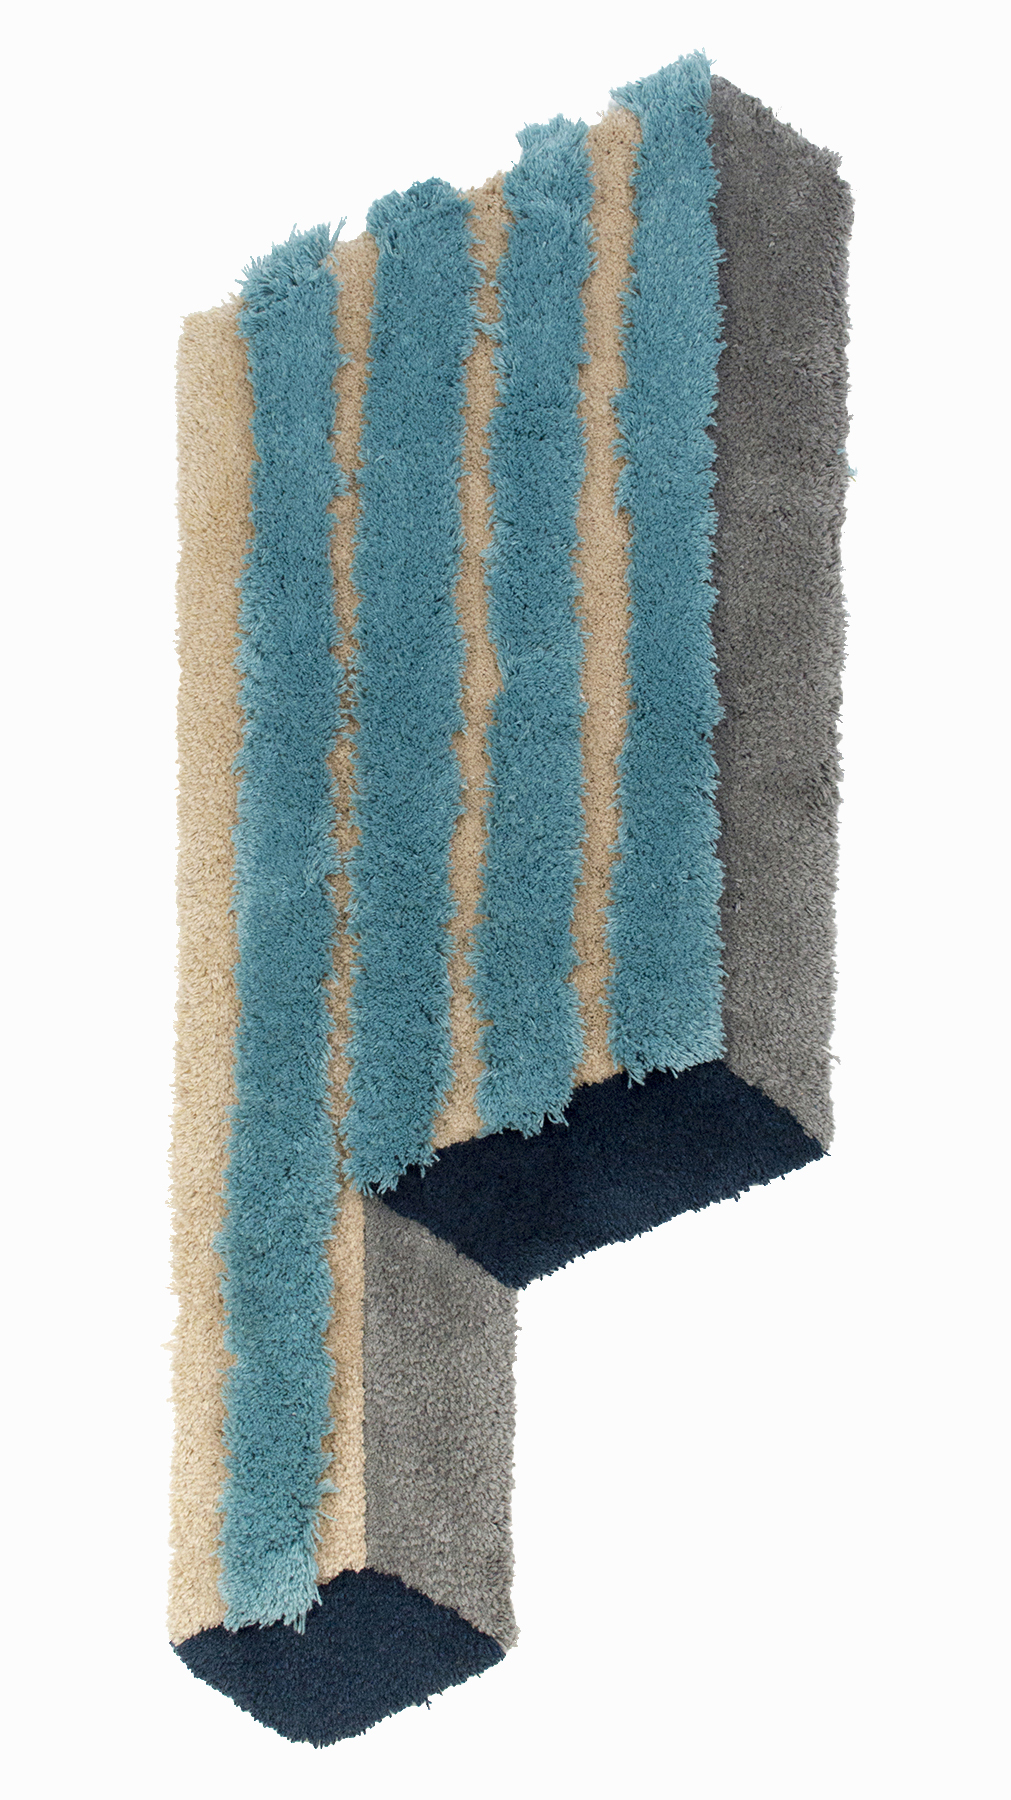 Alternate Row, 60 x 23 inches / 152.4 x 58.4 cm, wool yarn on wood panel, 2019